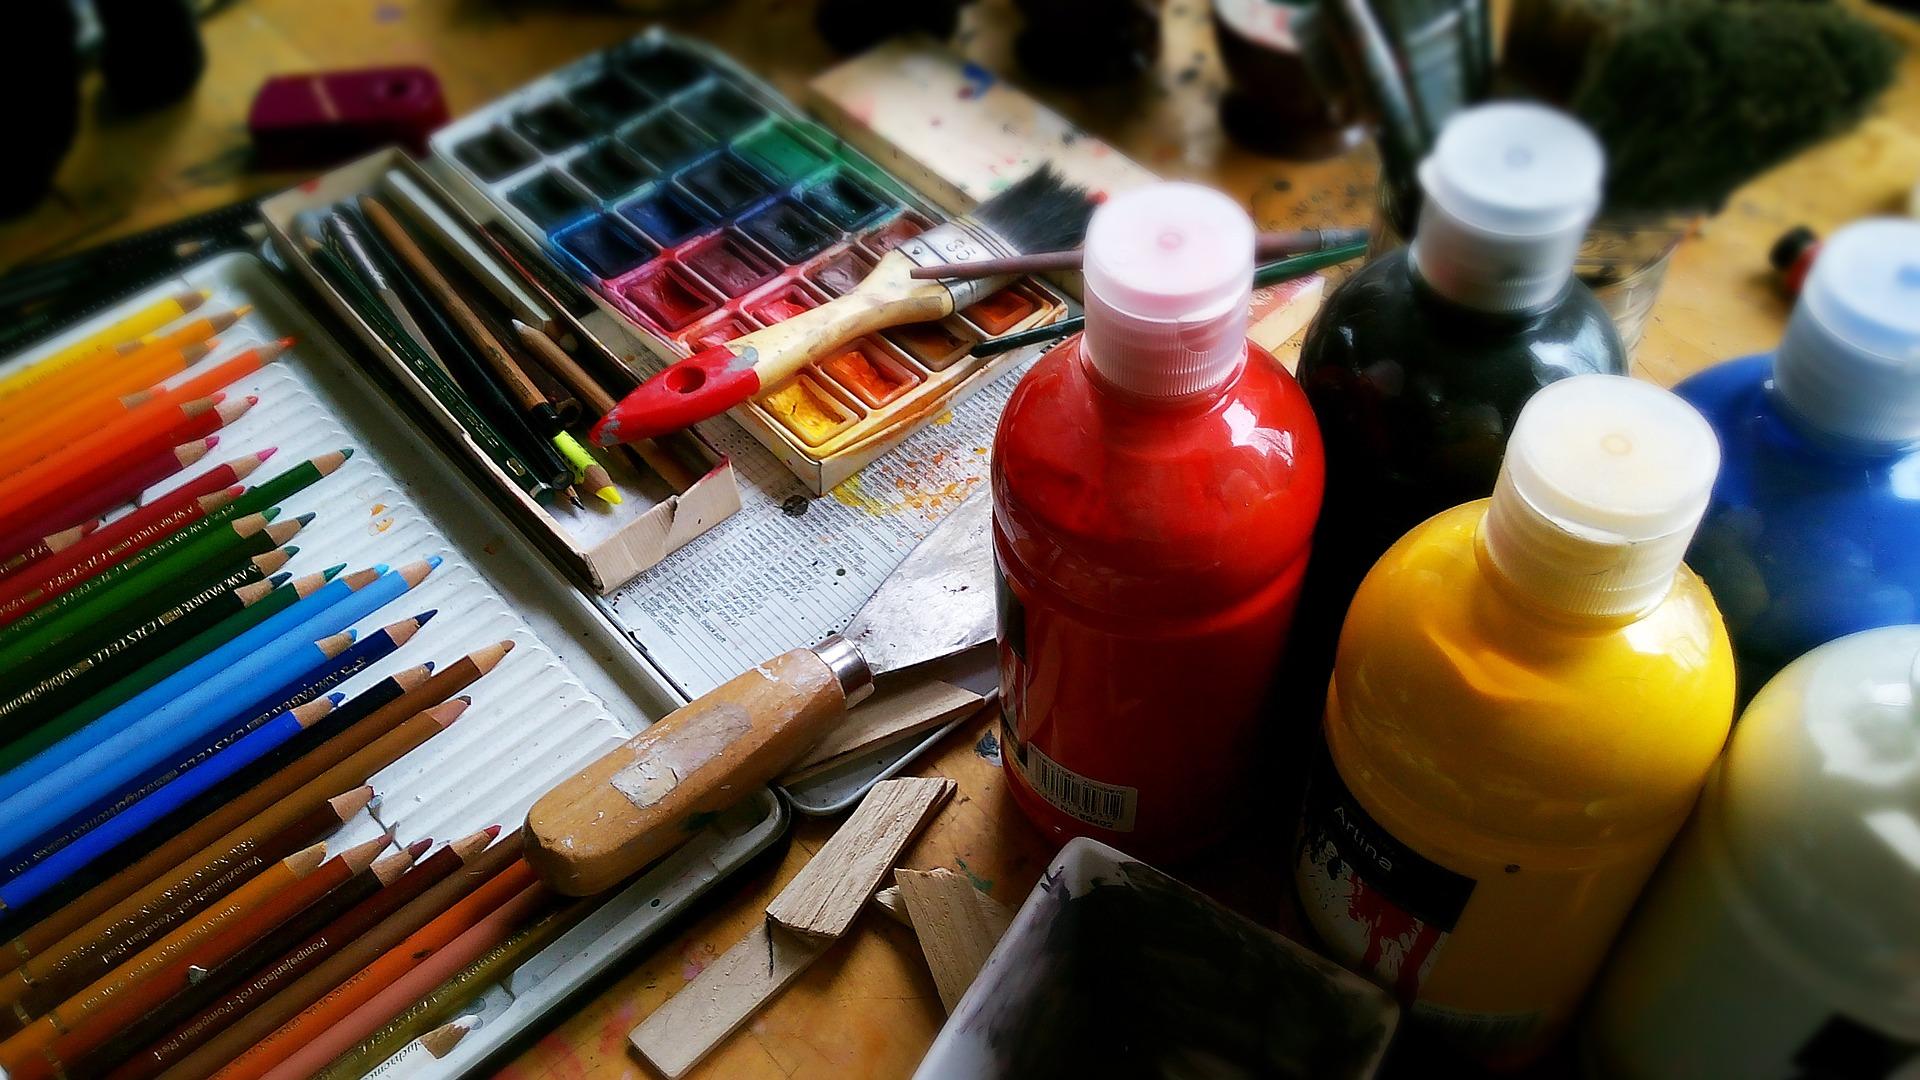 """ Painting Draw "" by bodobe via Pixabay ( CC0 Creative Commons )"